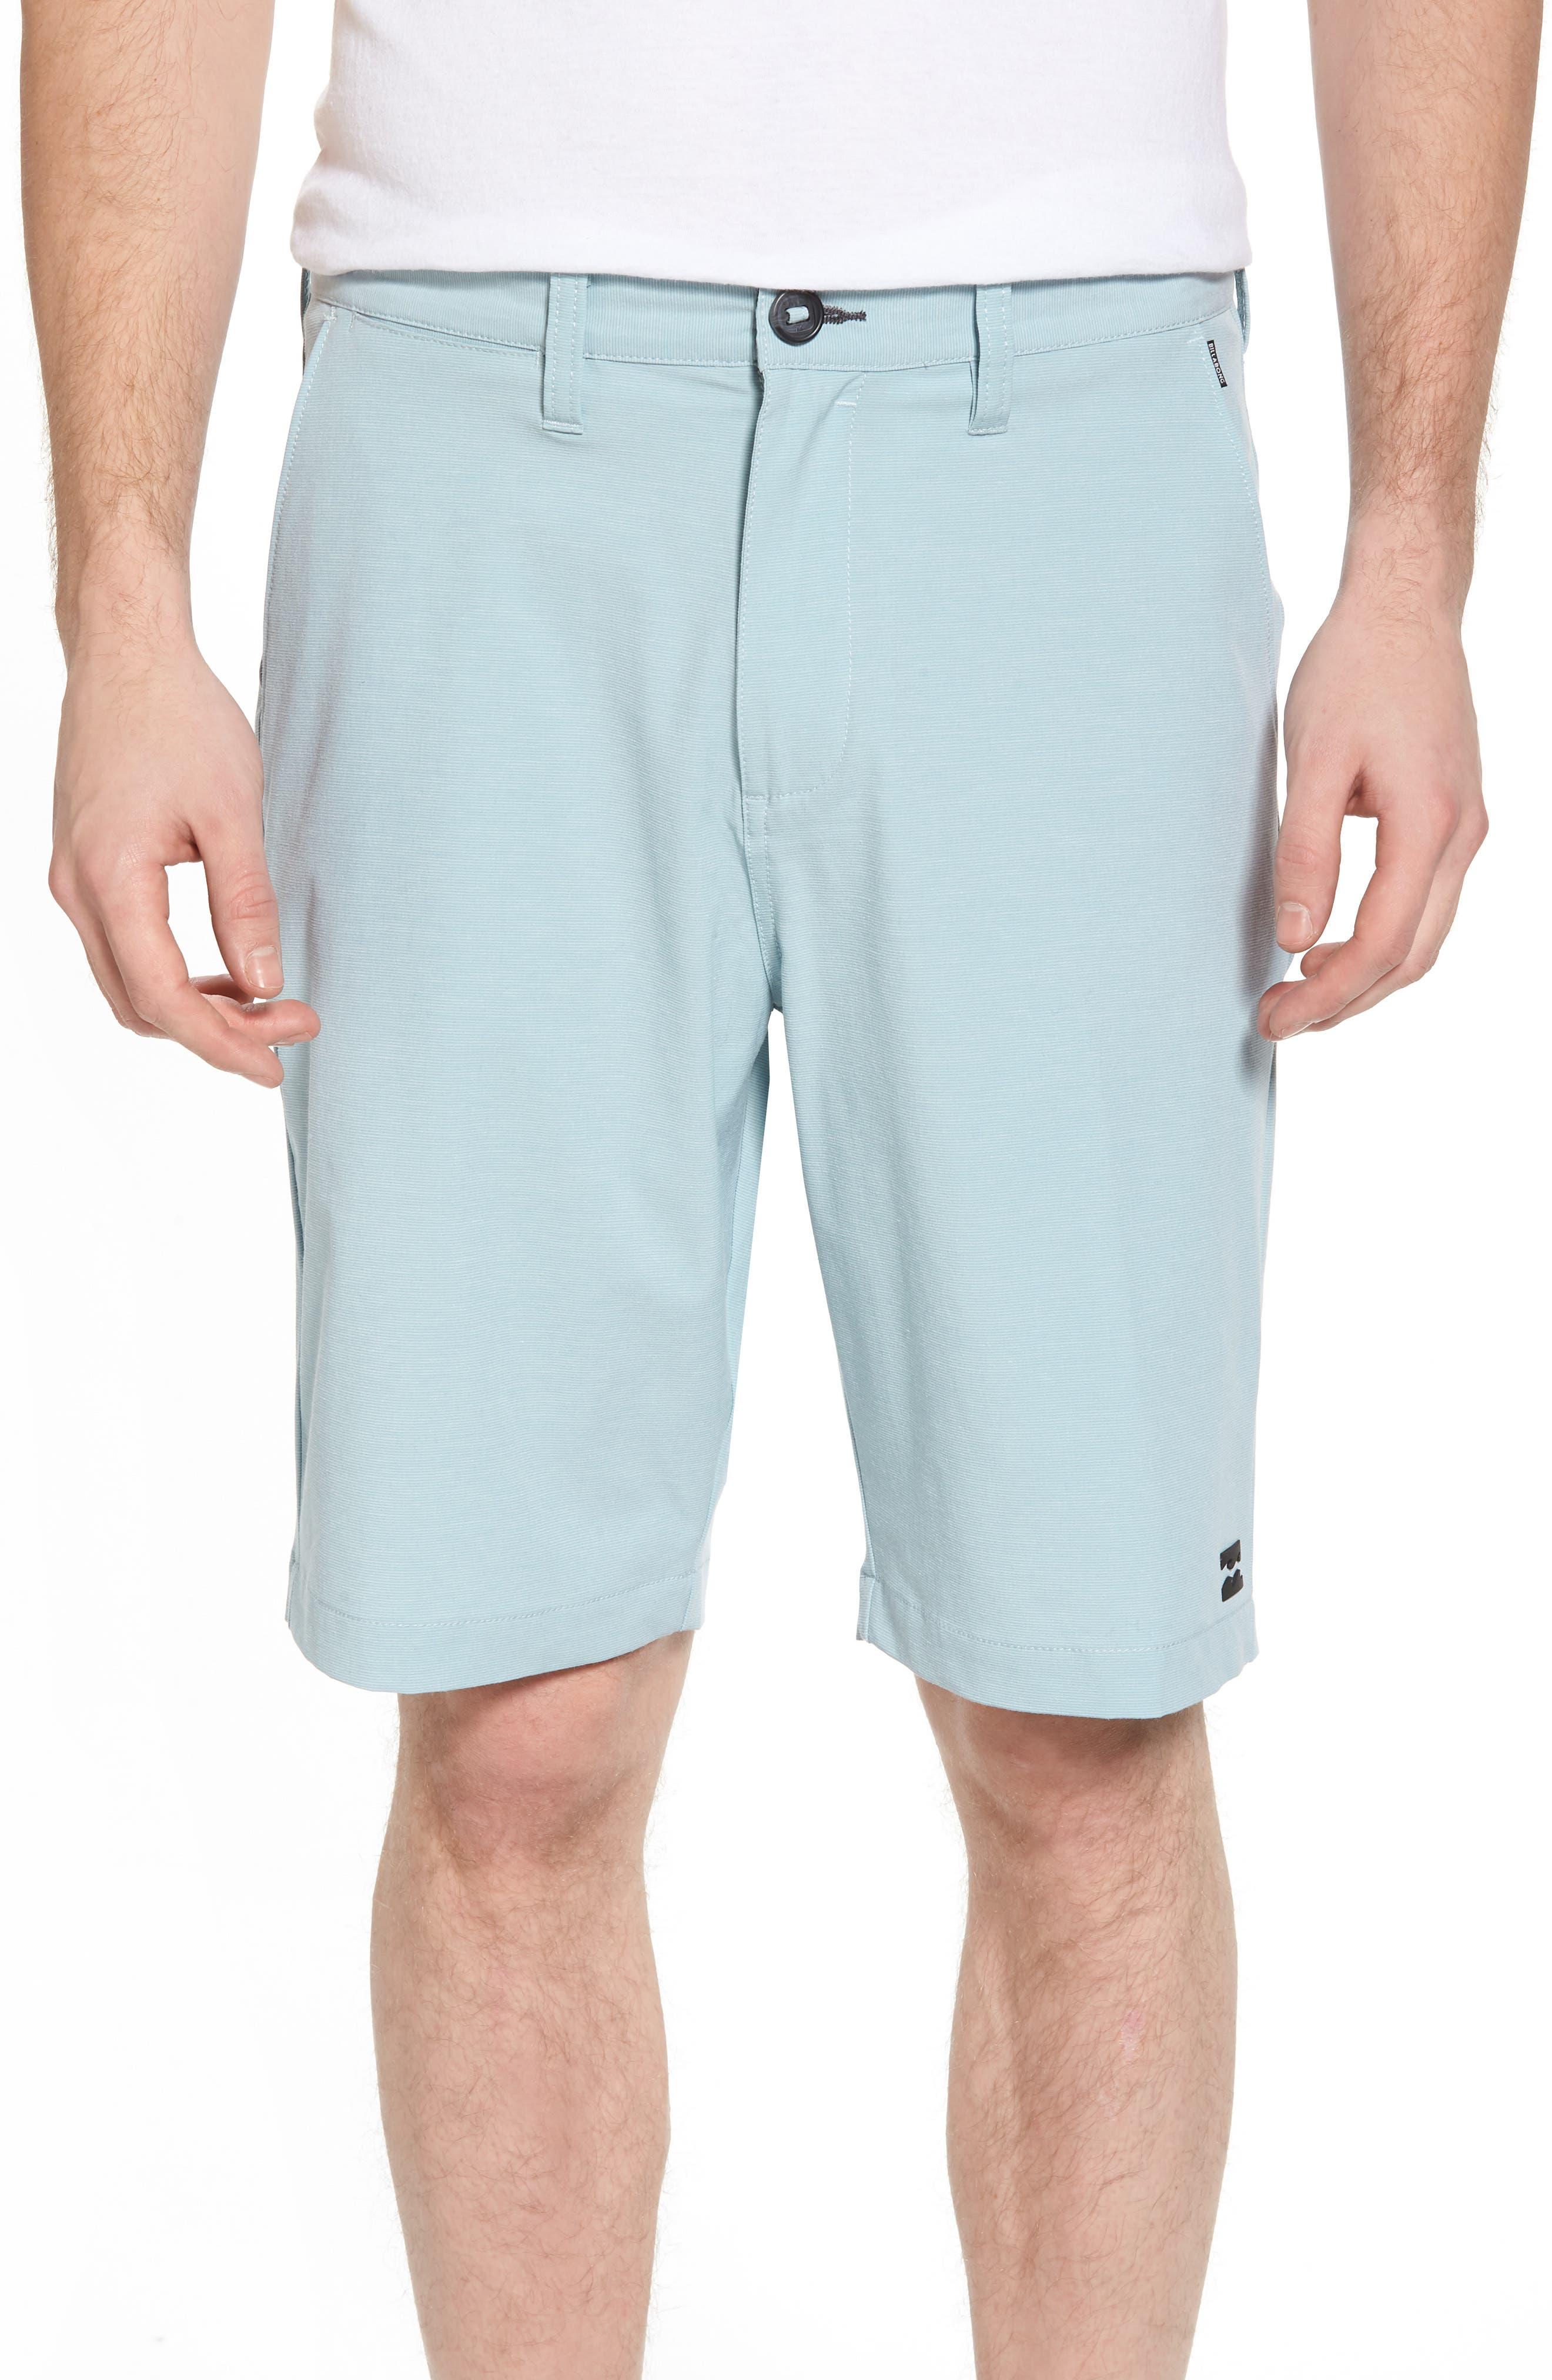 Below The Knee Boardshorts